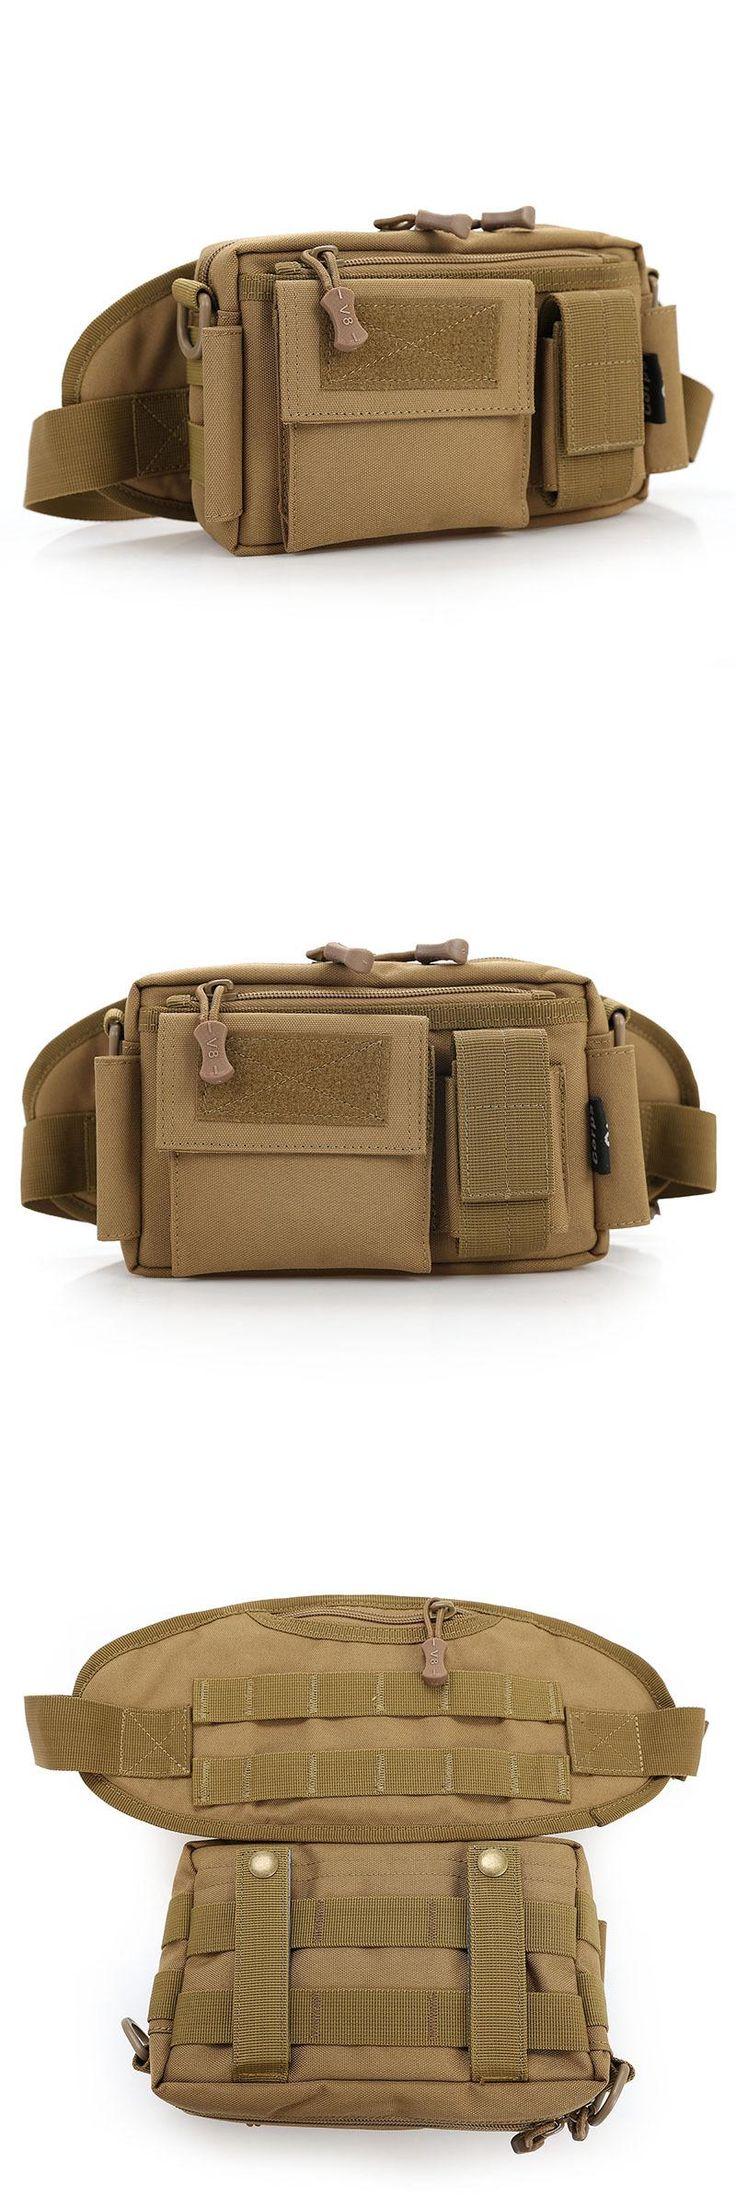 [Visit to Buy] Men's Waist Bag Military Equipment Men Bag Wallet Waist Packs Mobile Phone Case Waterproof Nylon Material Messenger Bags #Advertisement